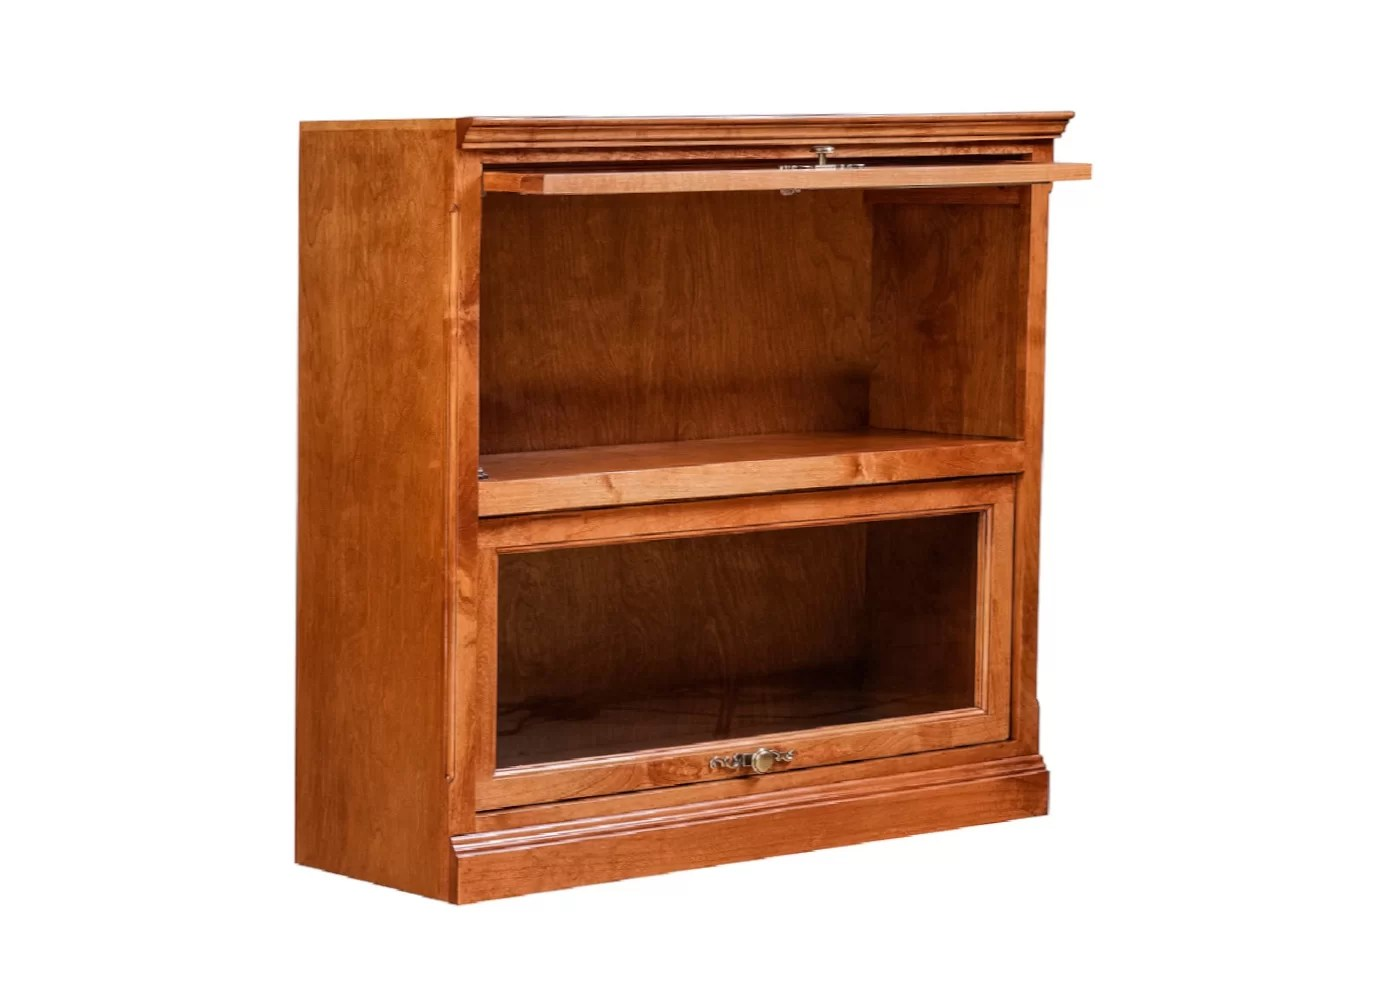 Mcintosh Barrister Bookcase